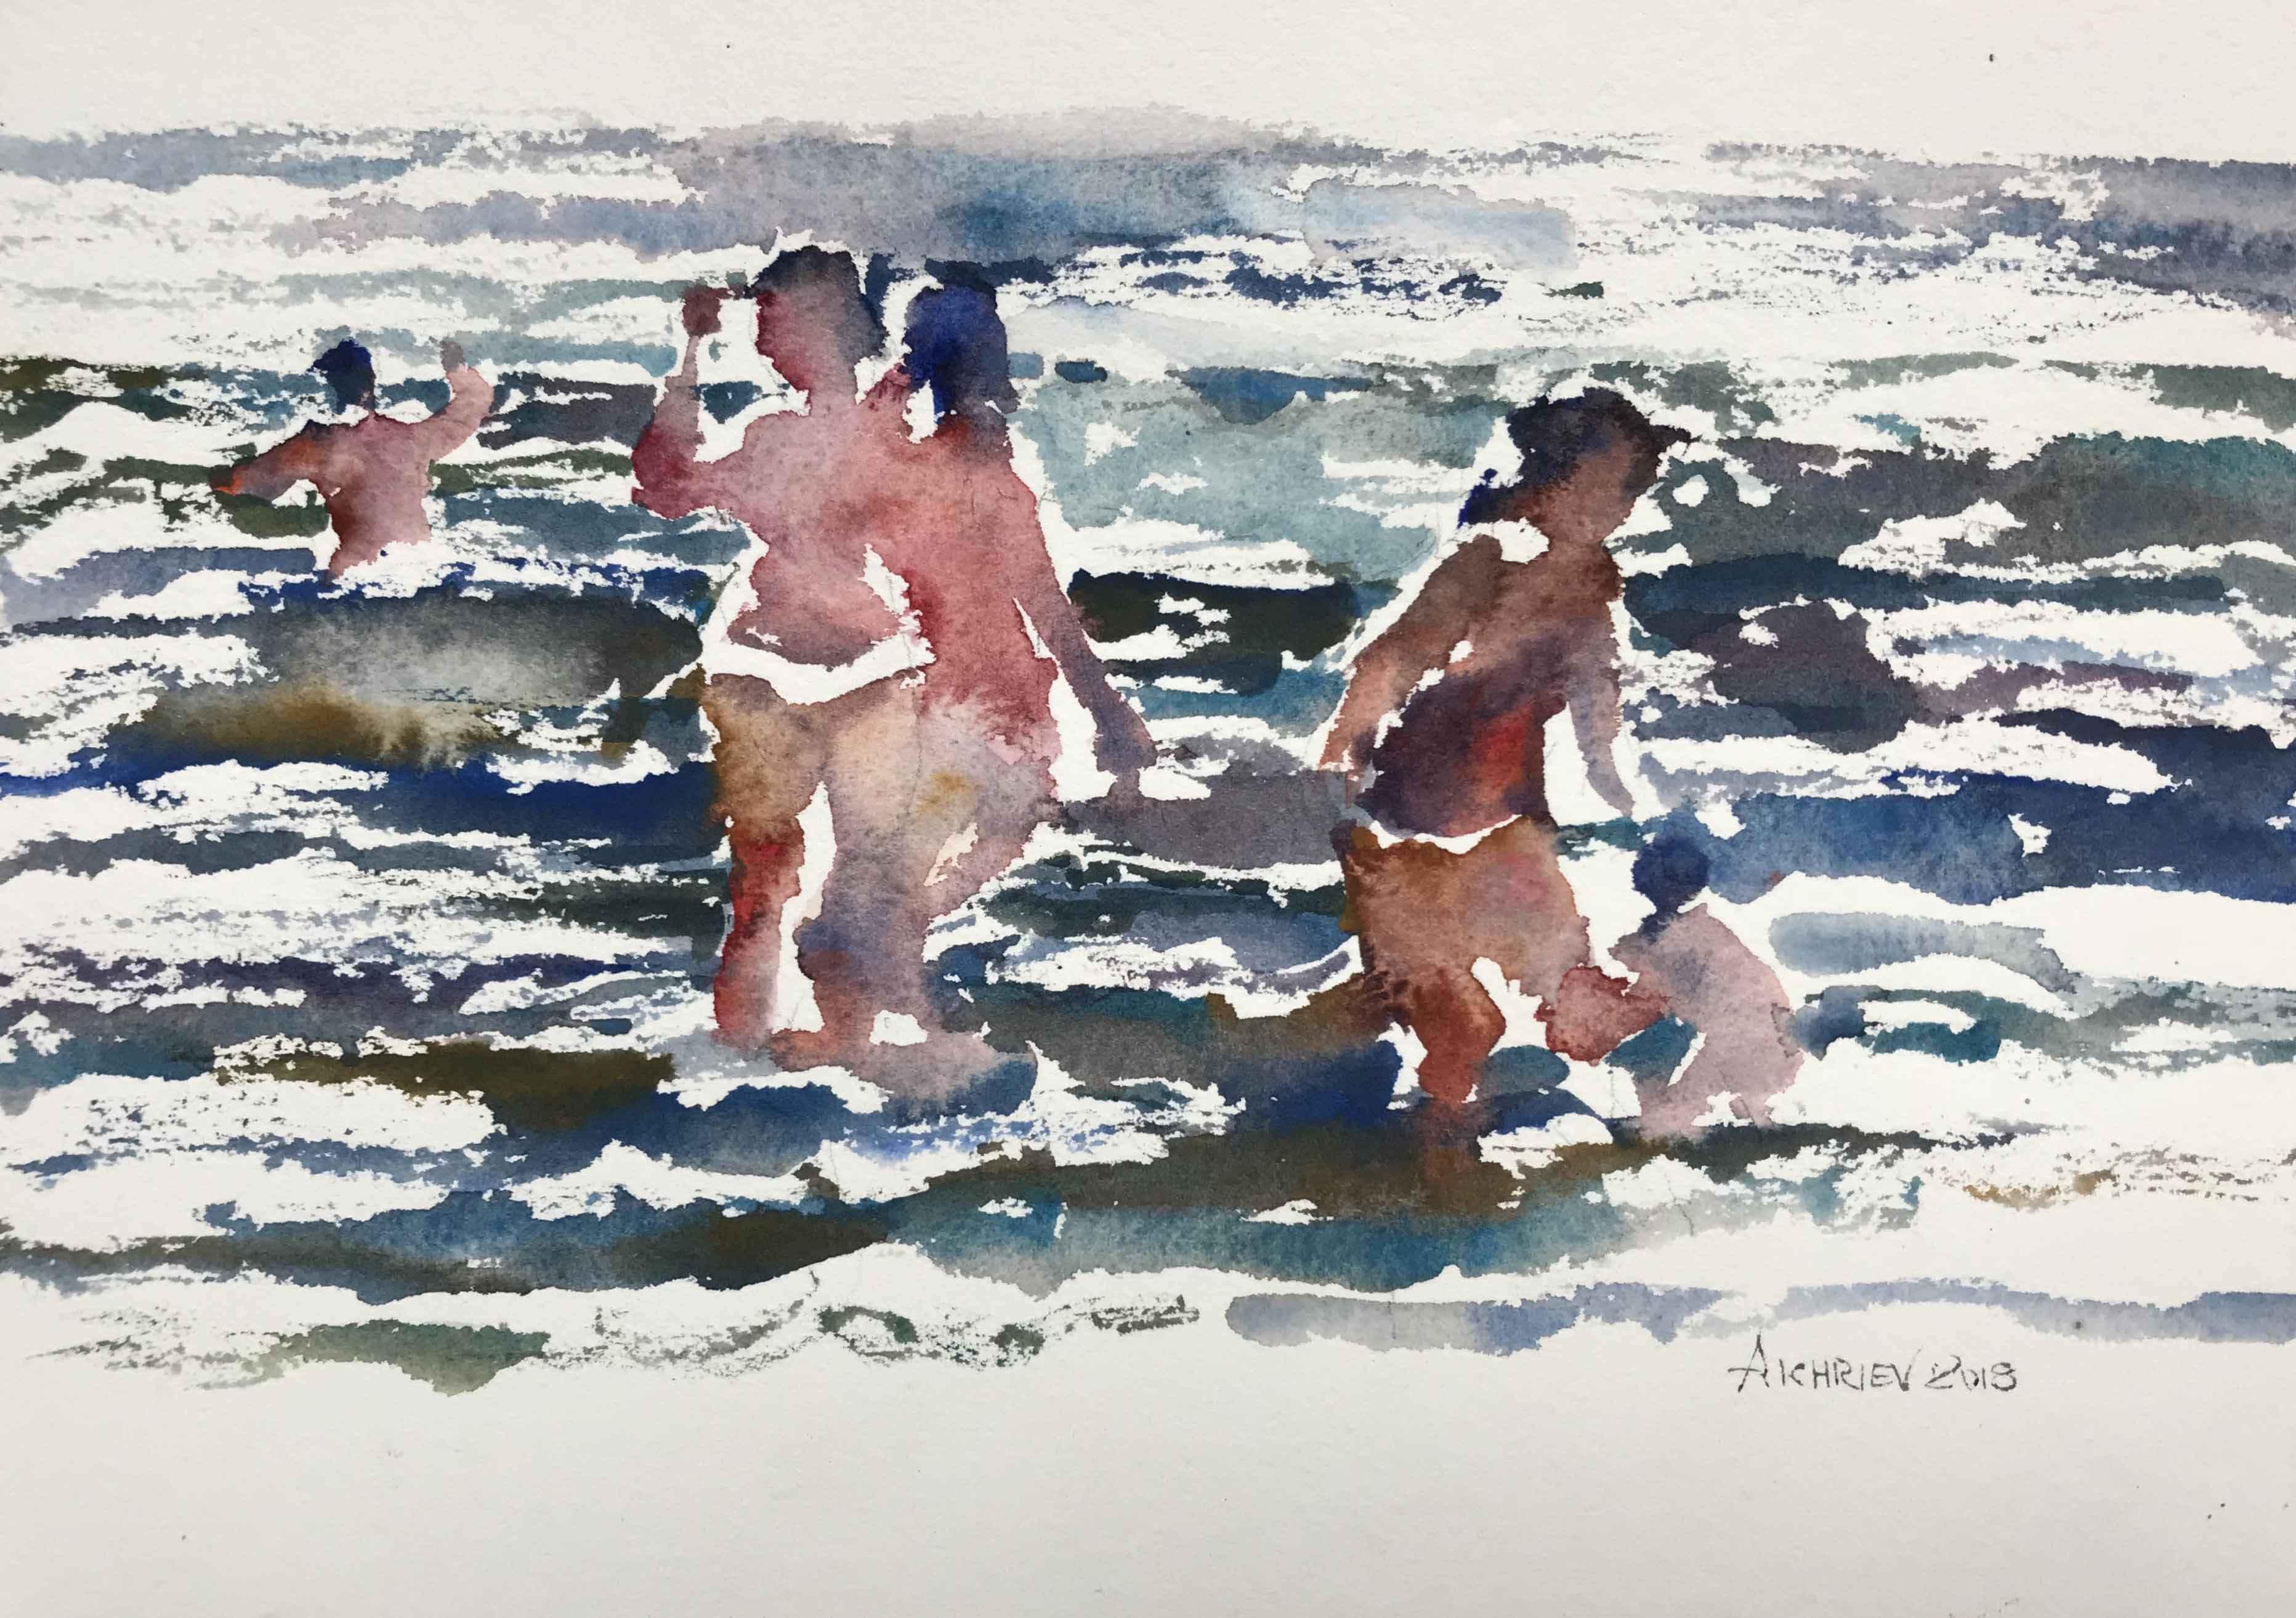 Beach Series IX by  Daud Akhriev - Masterpiece Online